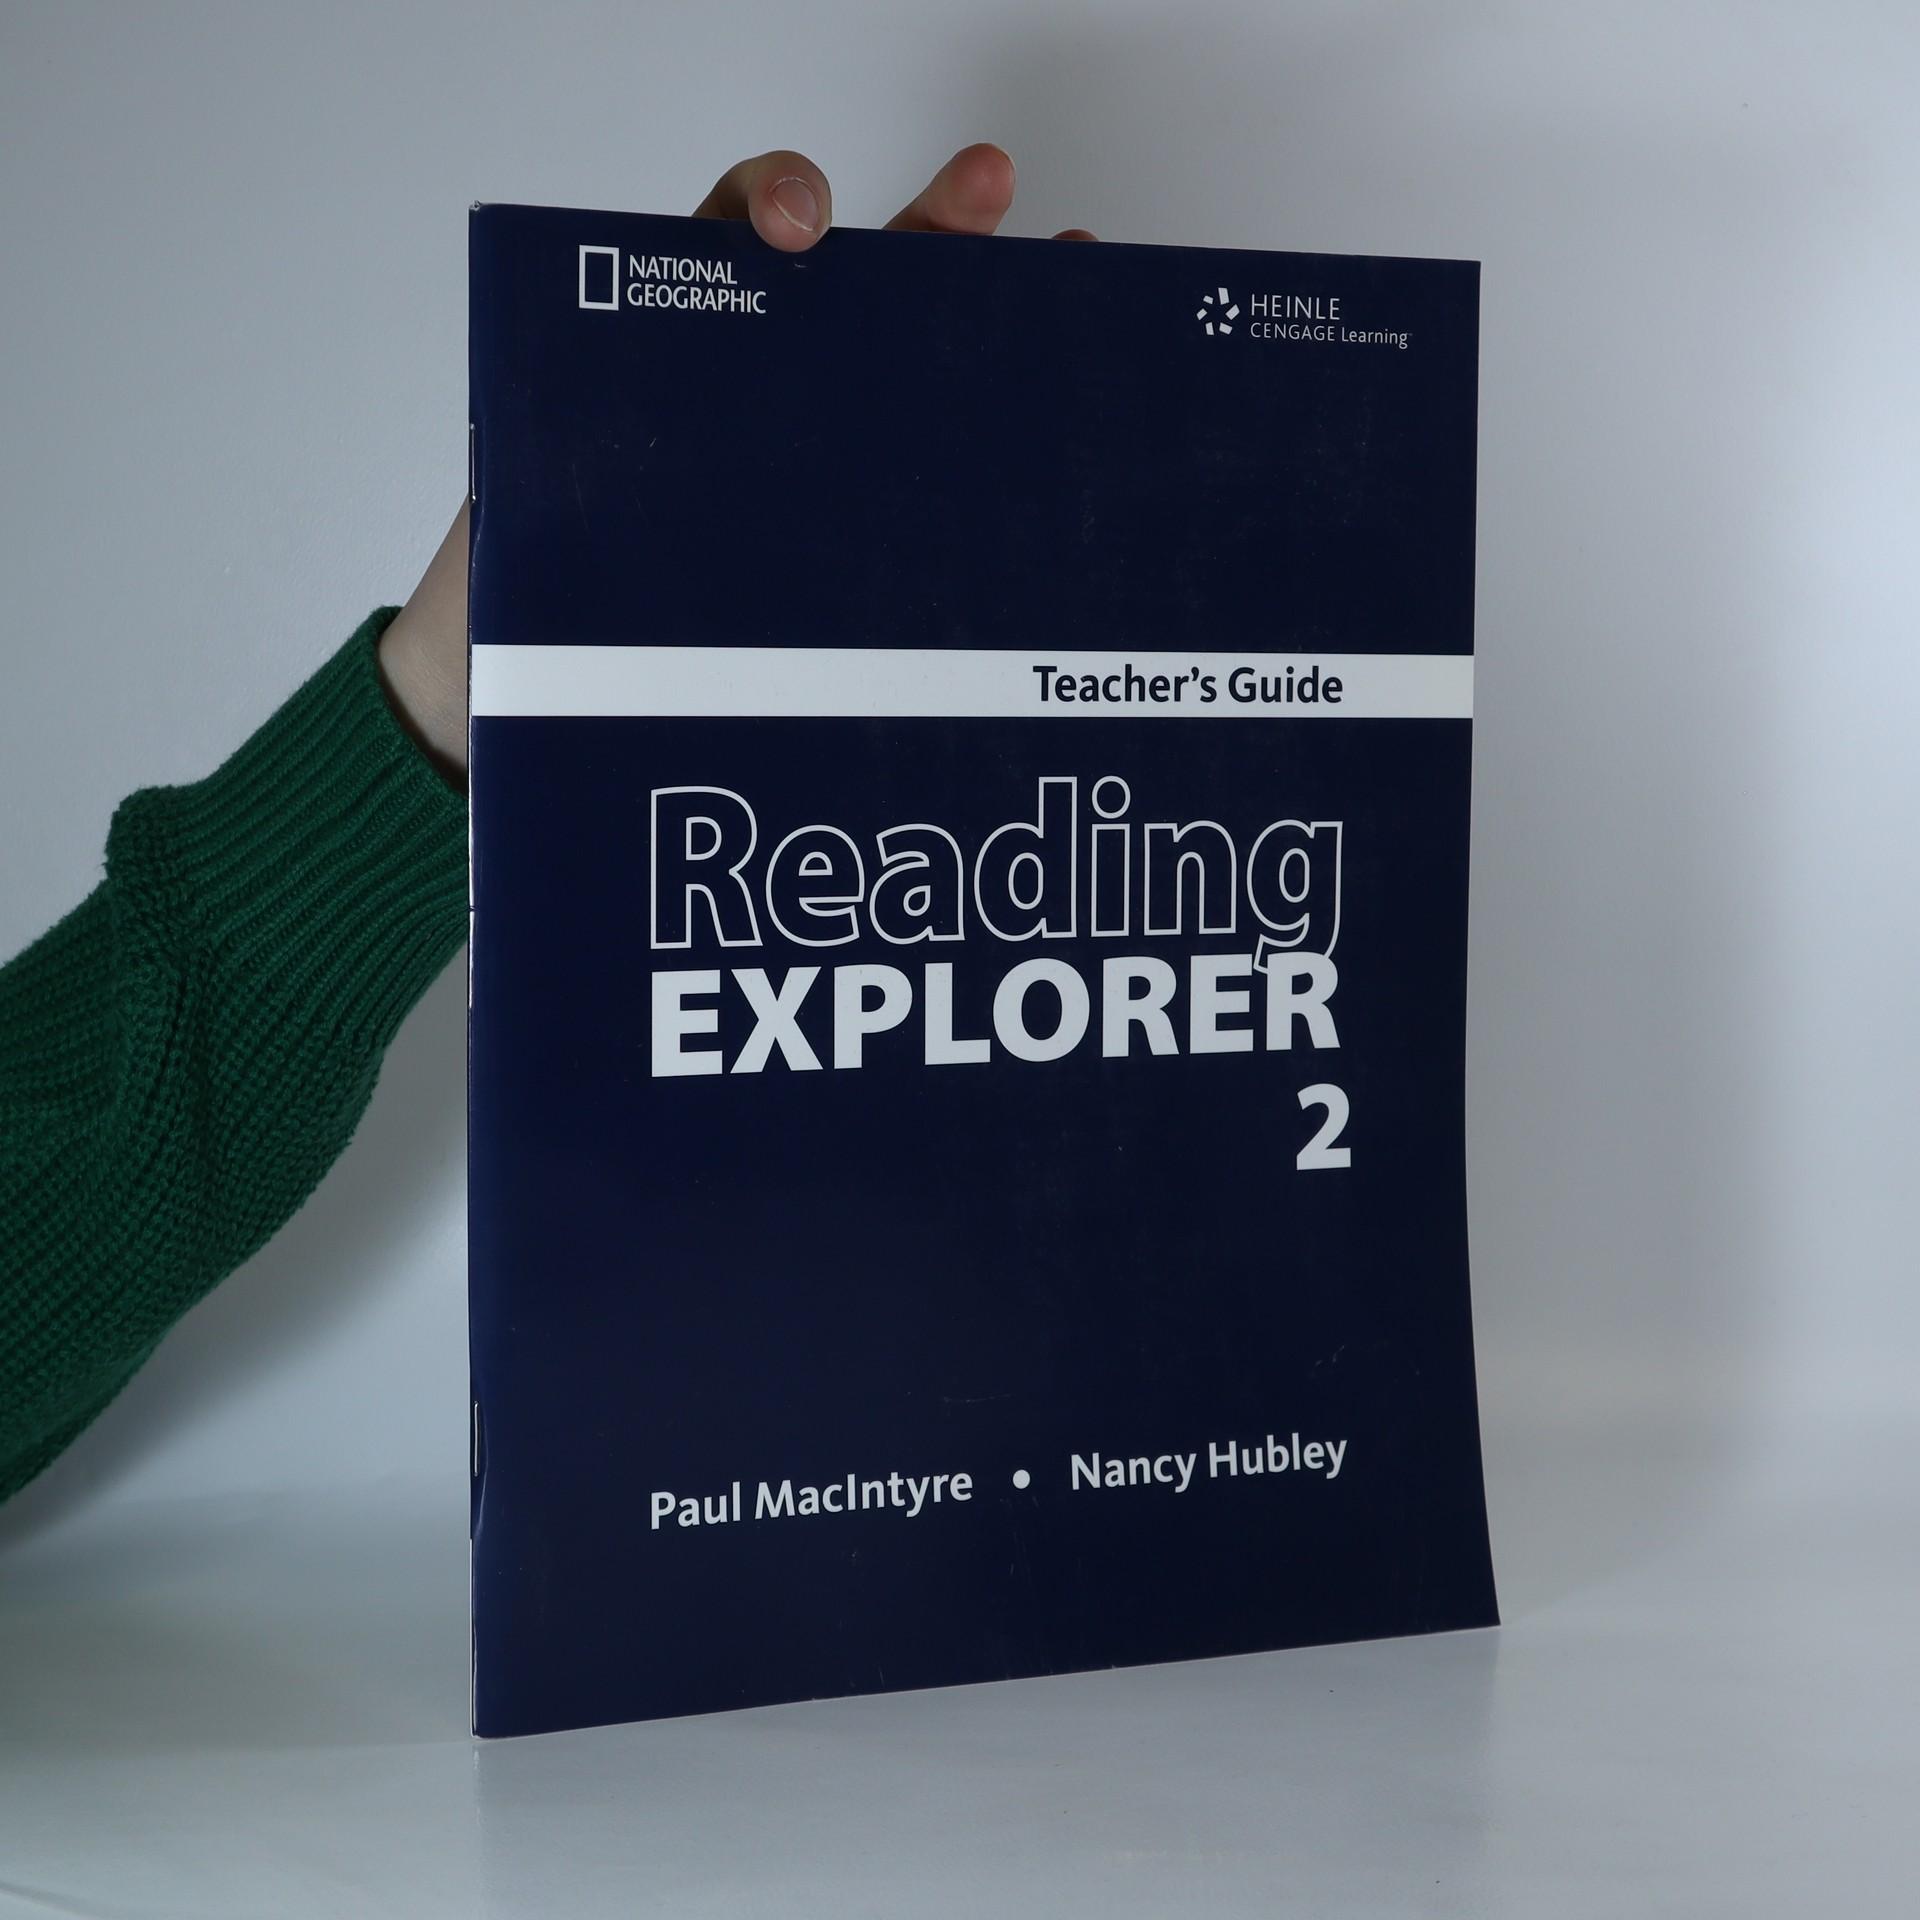 antikvární kniha Reading explorer 2 : teacher's guide, 2010